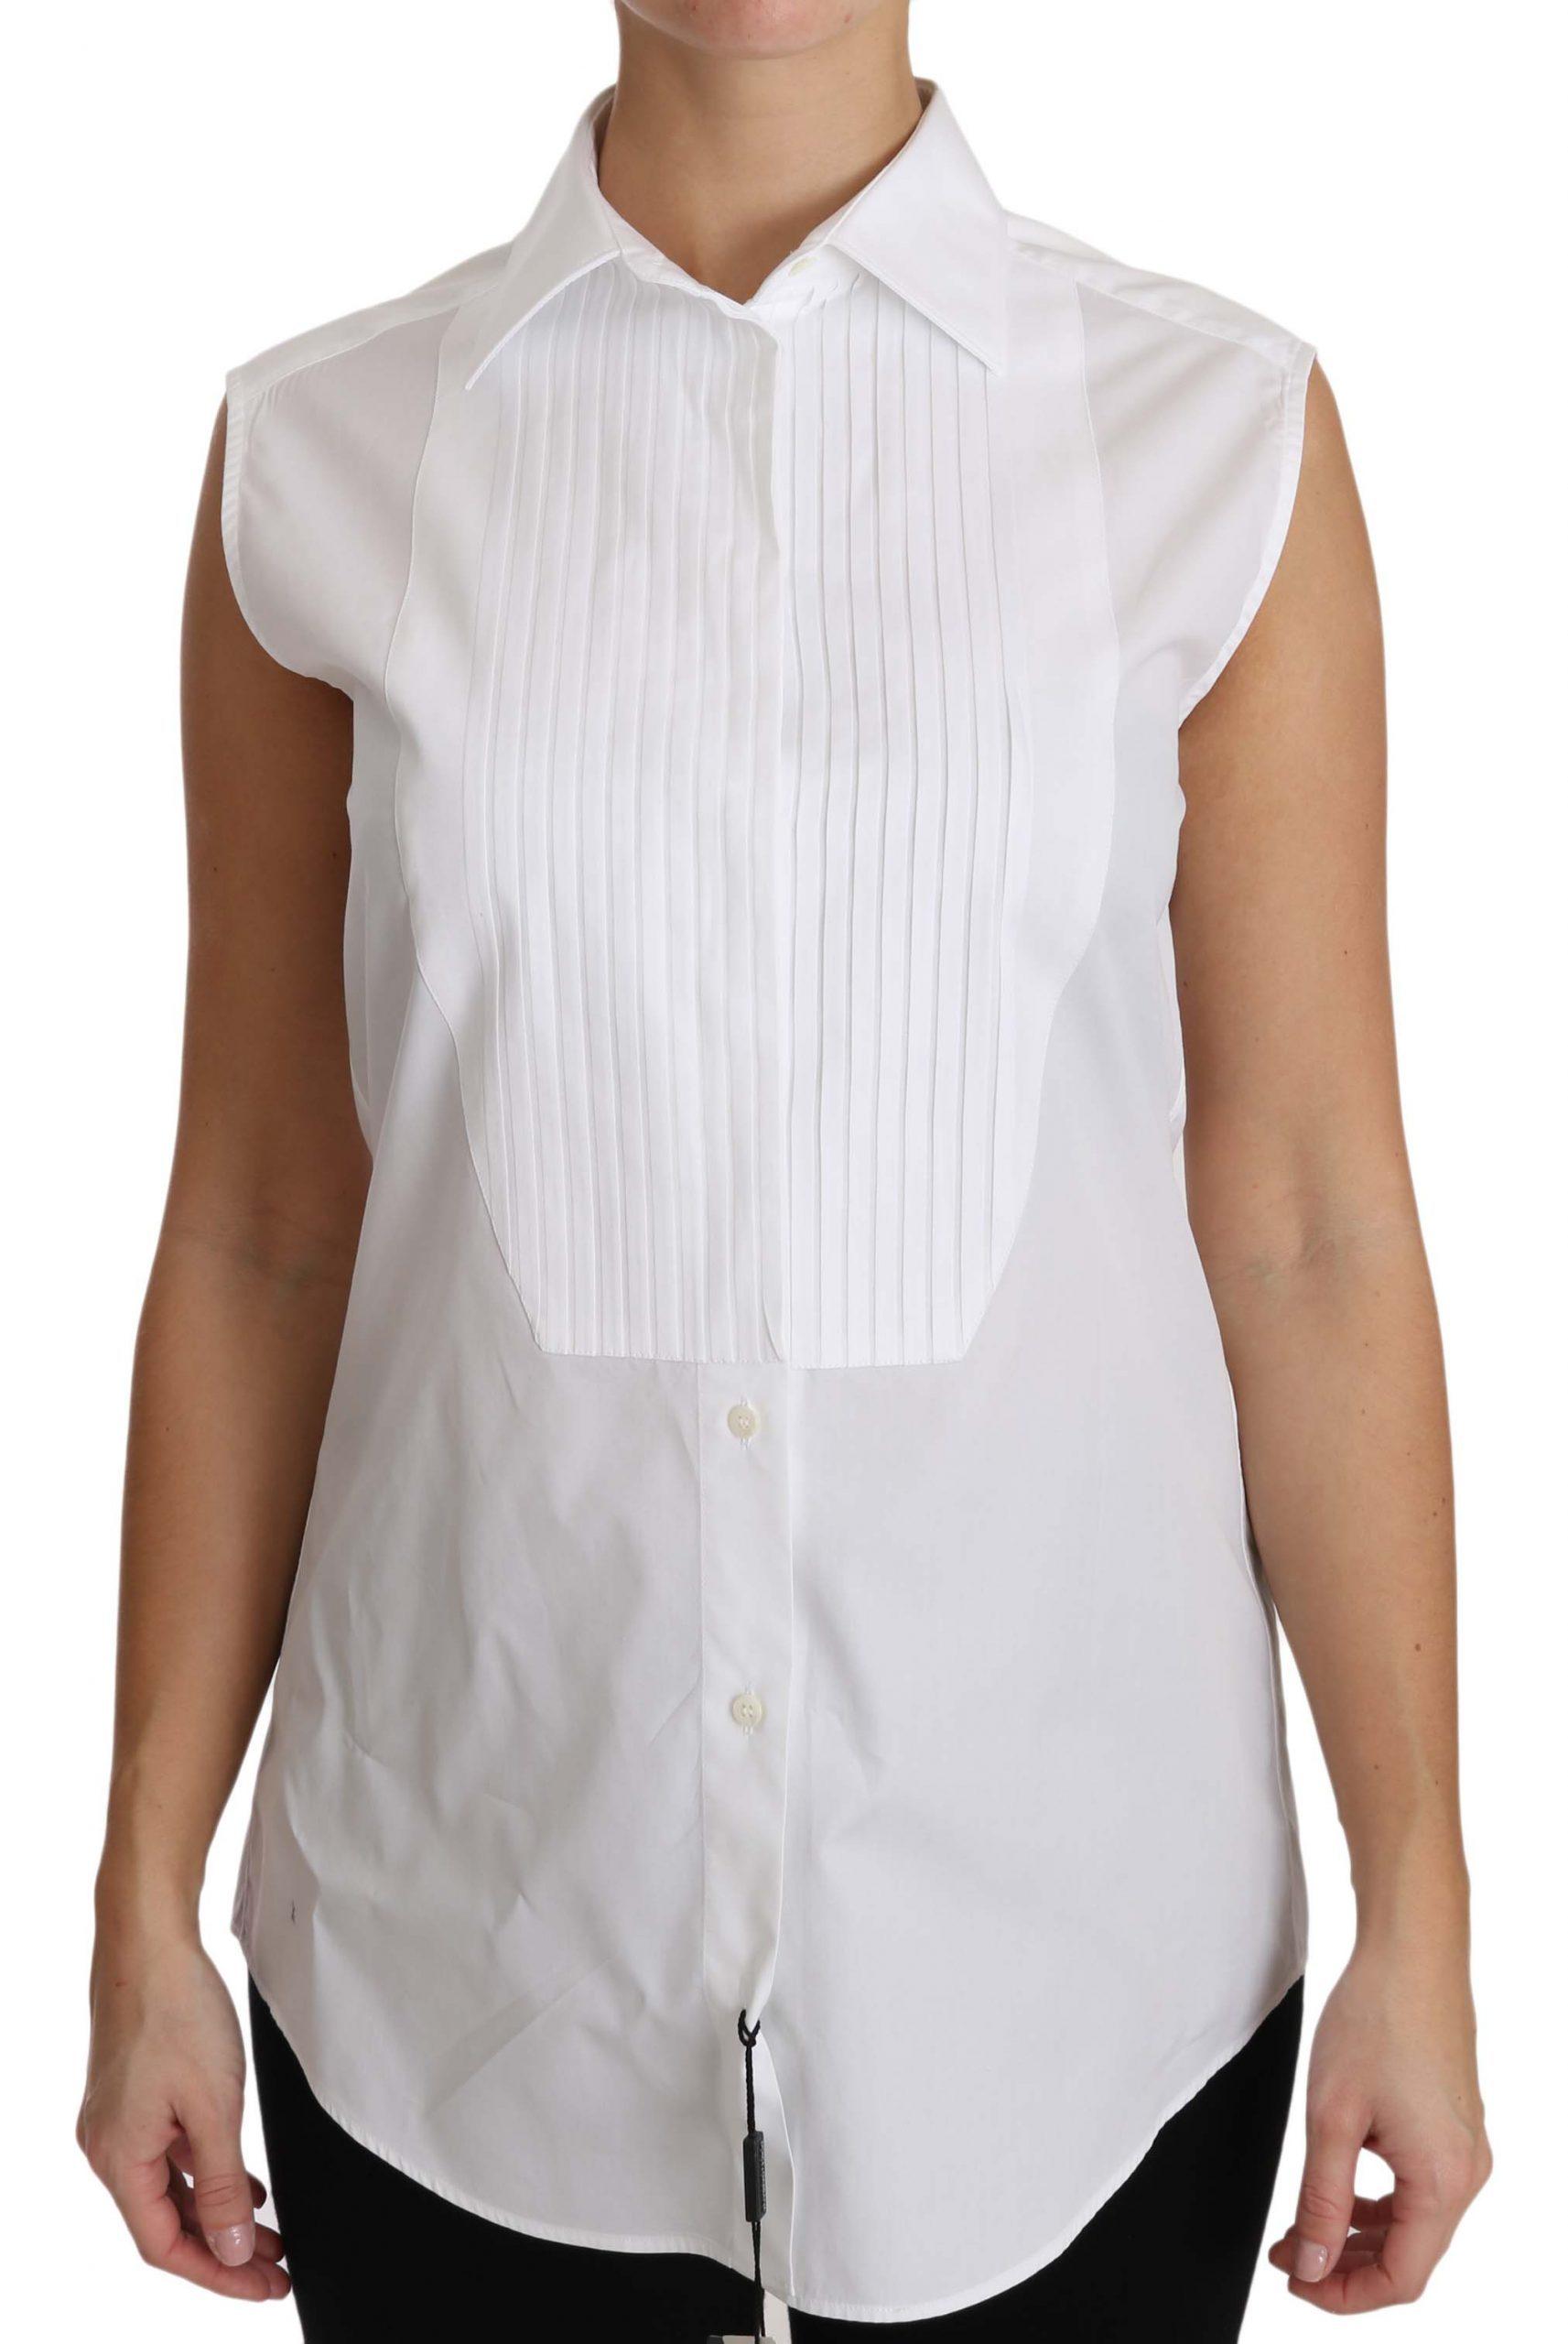 Dolce & Gabbana Women's Collar Sleeveless Tops White TSH2948 - IT42|M